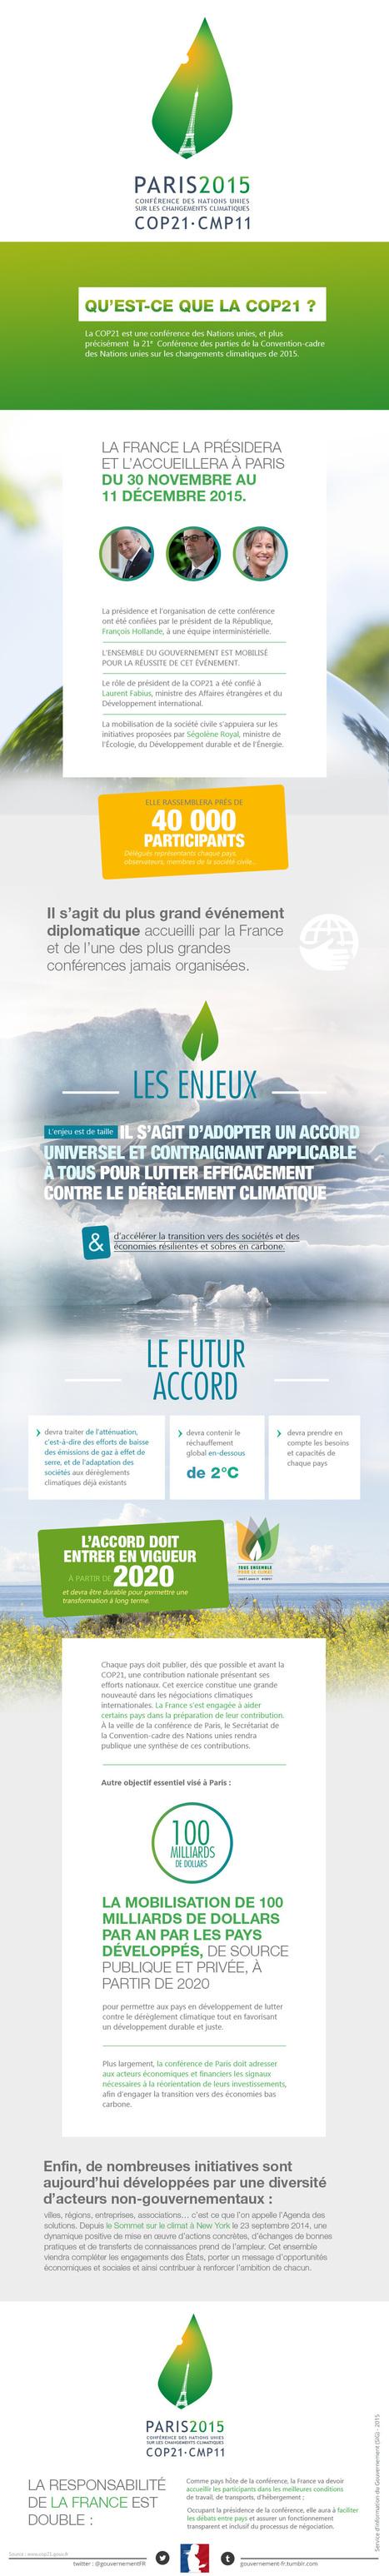 Comprendre la #COP21 | Home | Scoop.it